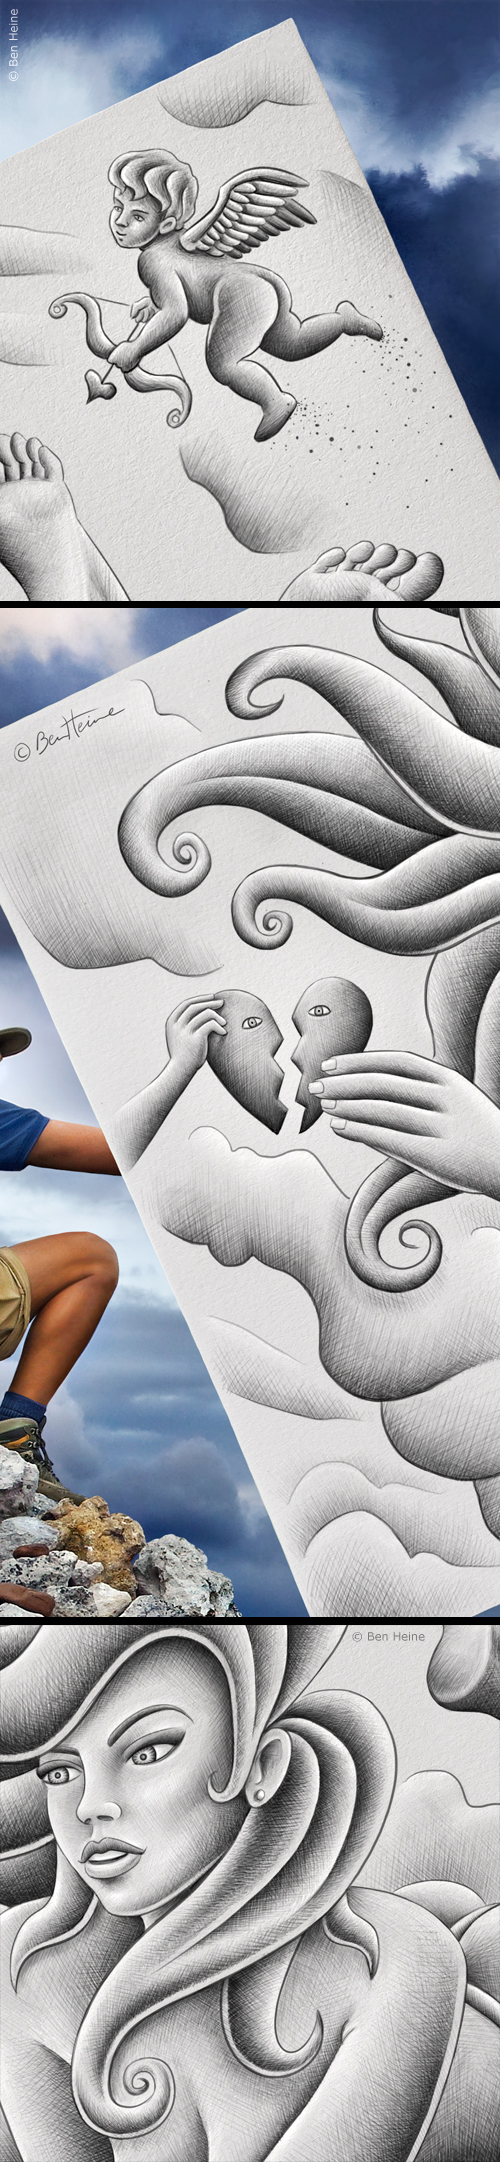 - Details - Pencil vs Camera - 61 (Ben Heine)